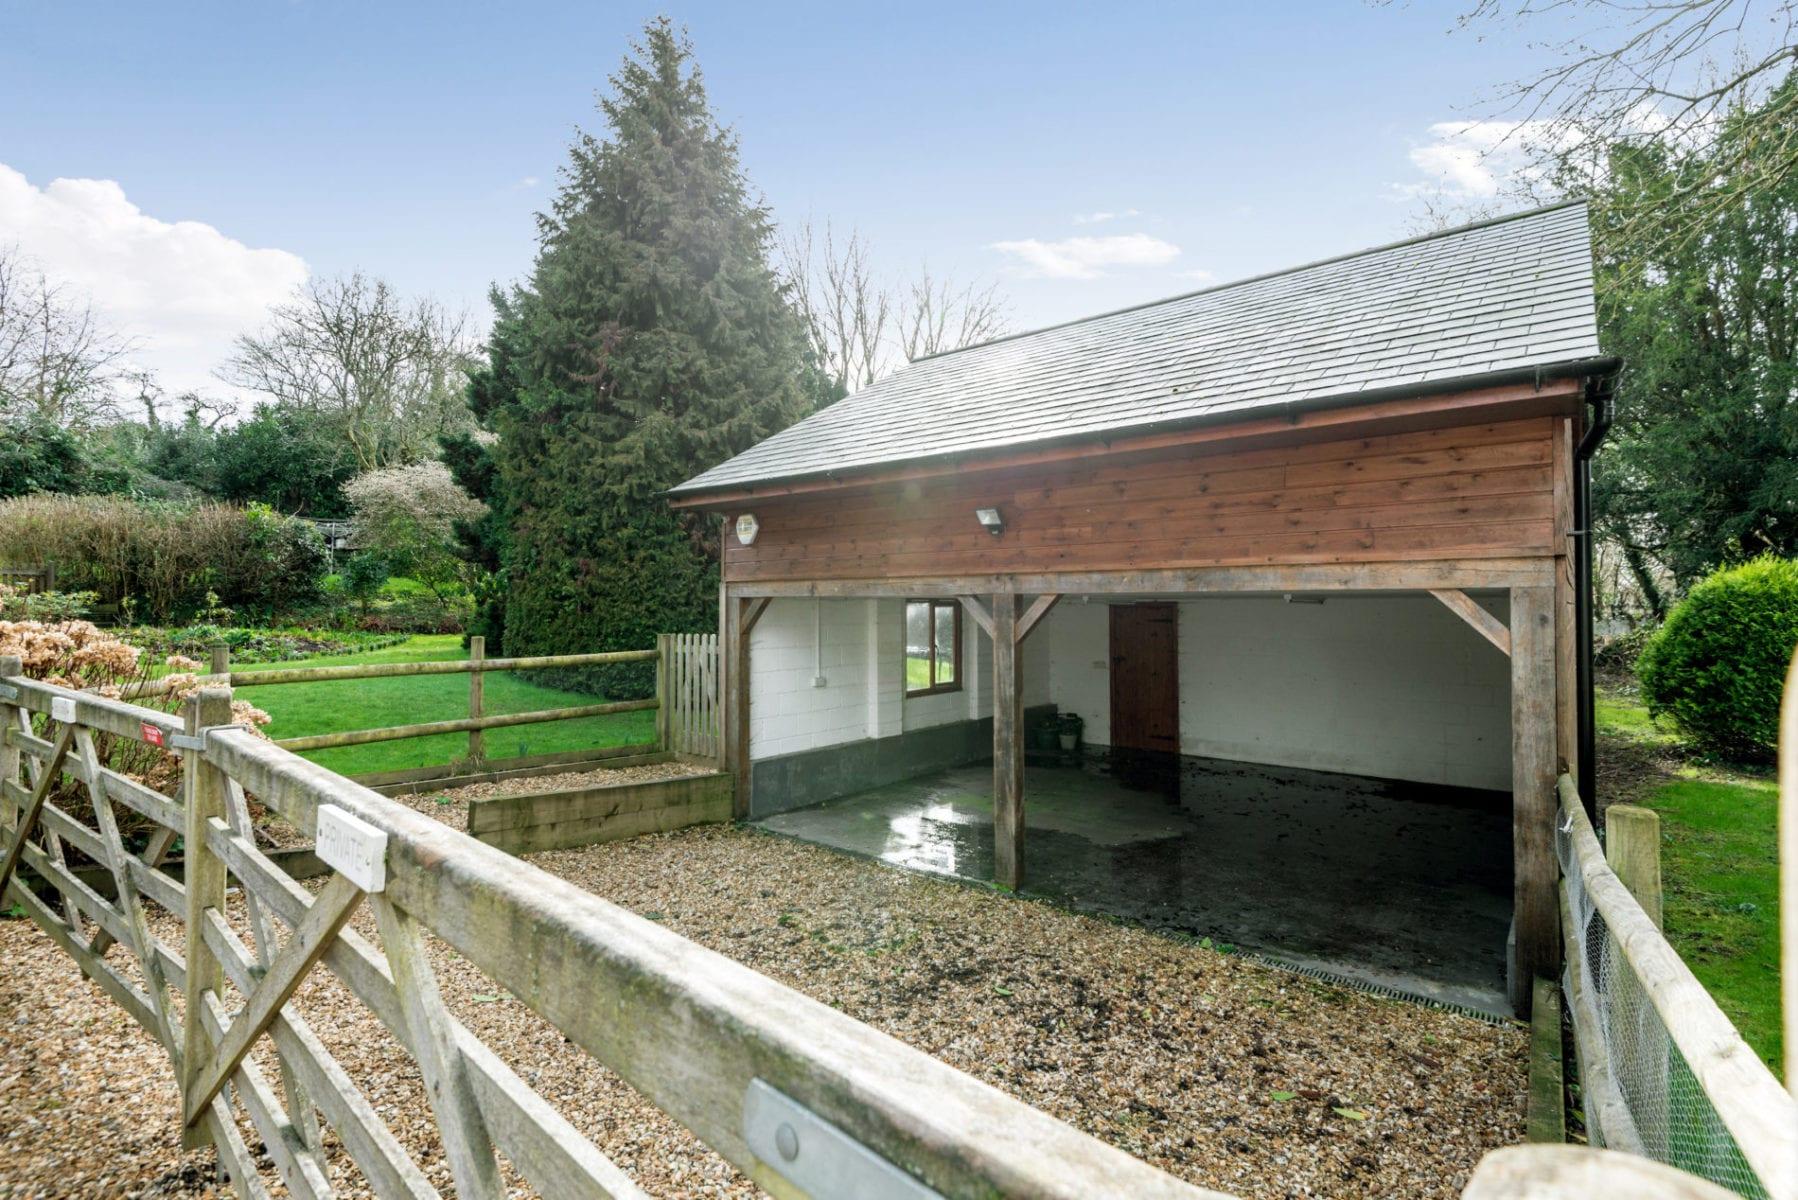 Beck Cottage, Games Room and parking